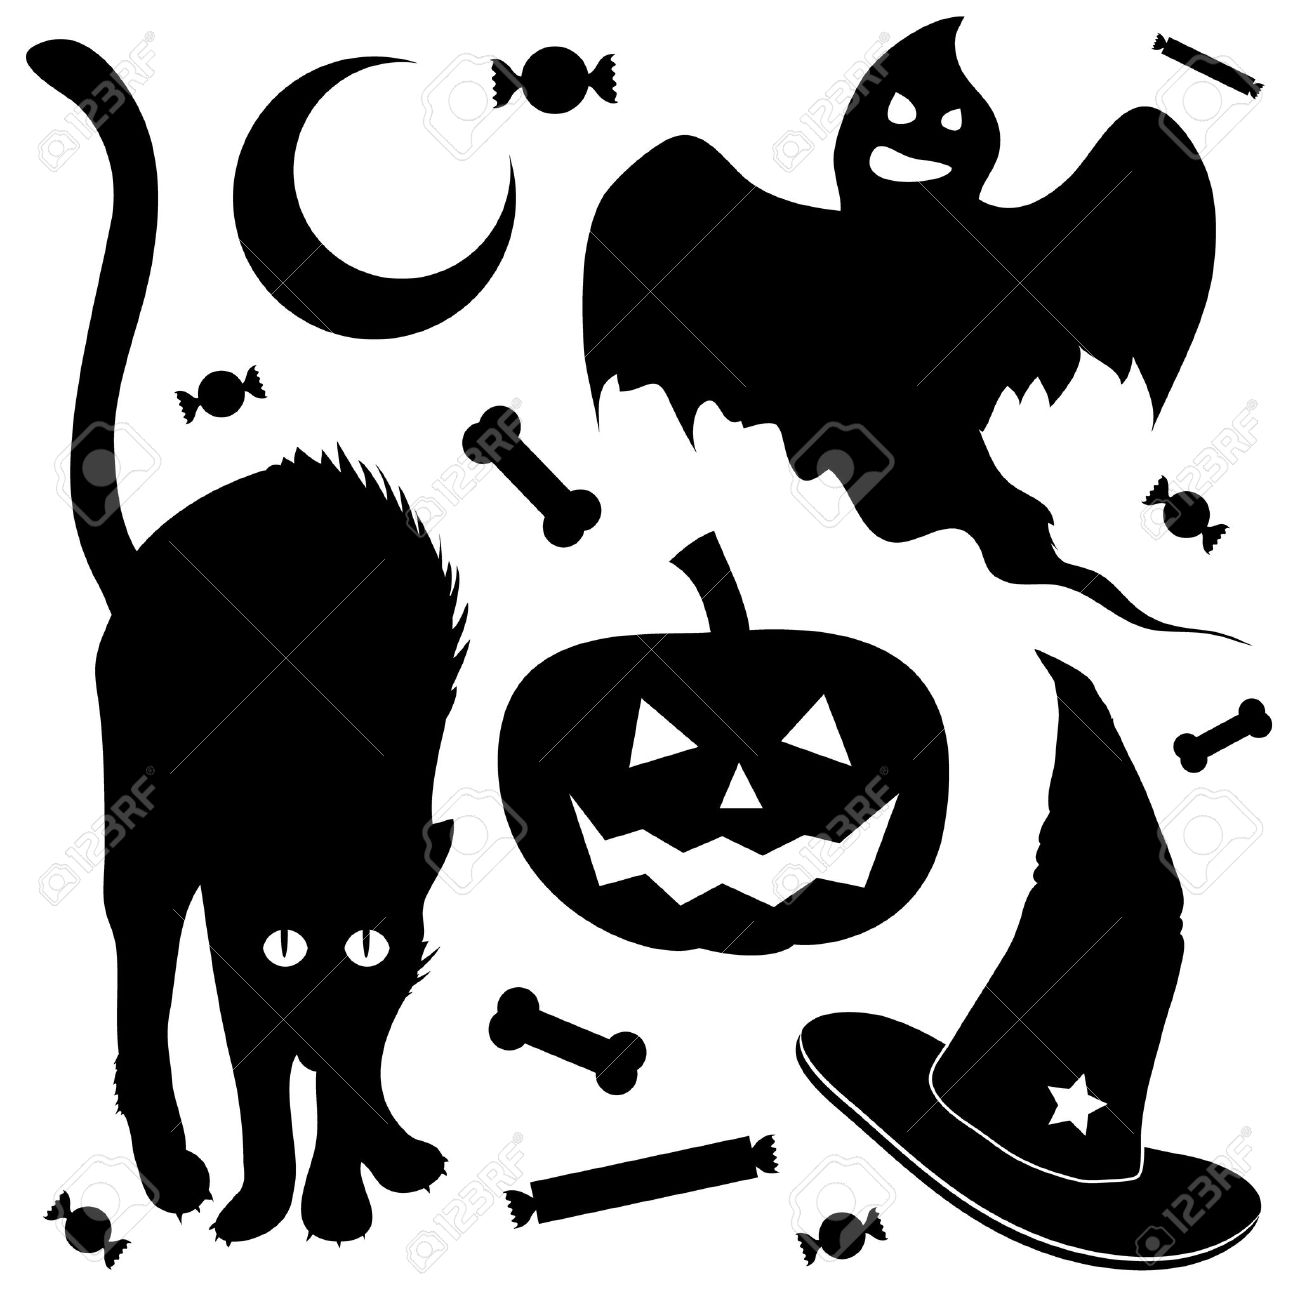 Halloween Design Elements Silhouette Set. Includes Black Cat.